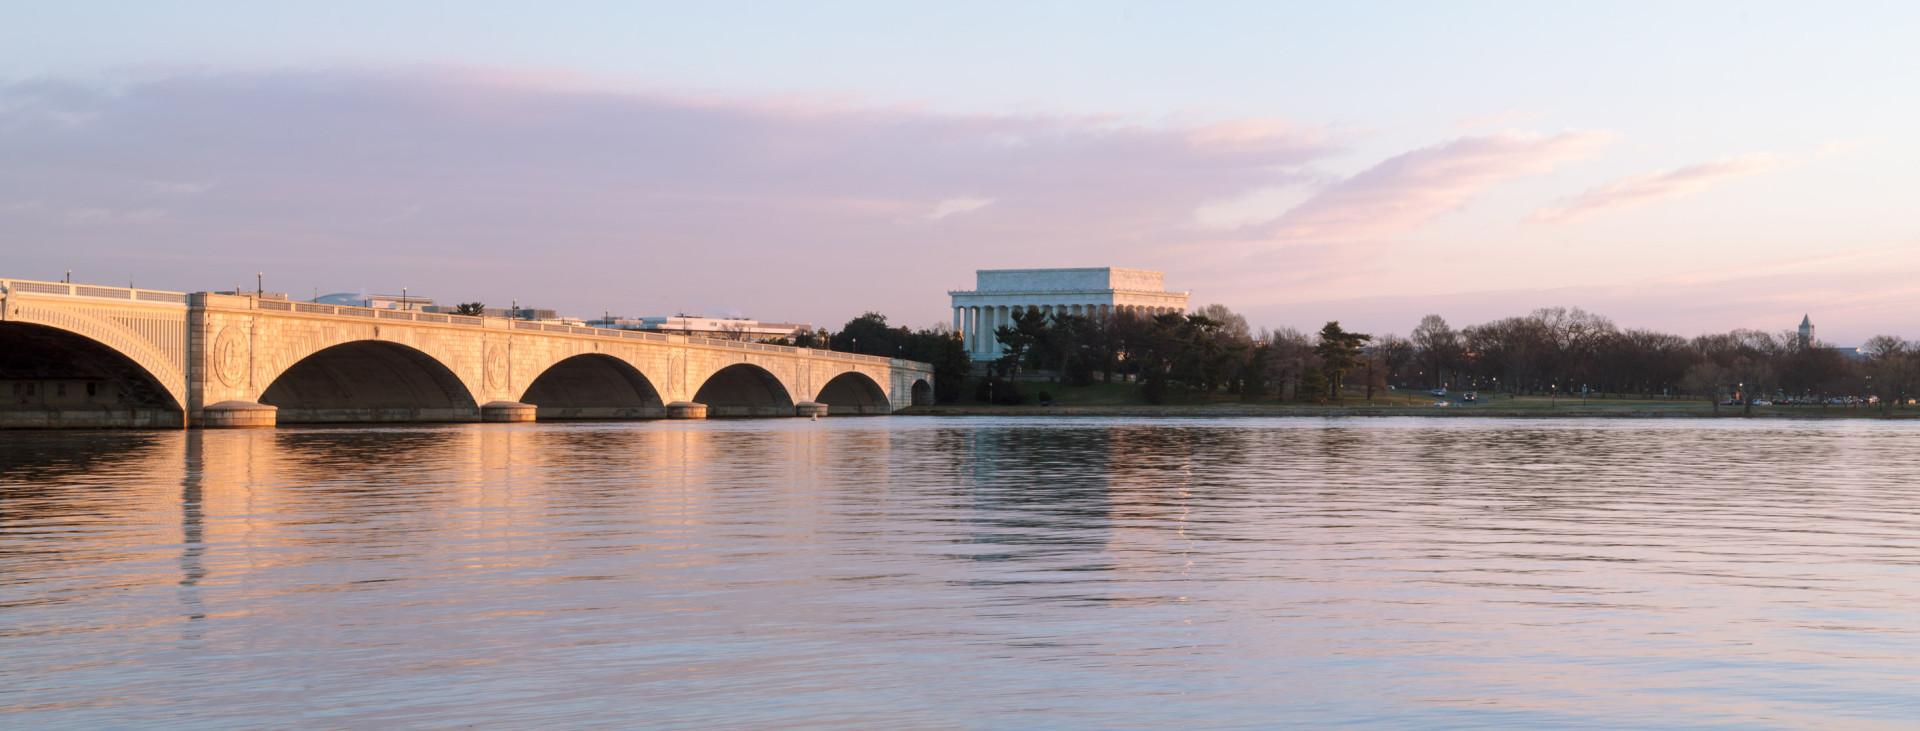 Washington D.C. | Christina Minniti Photography